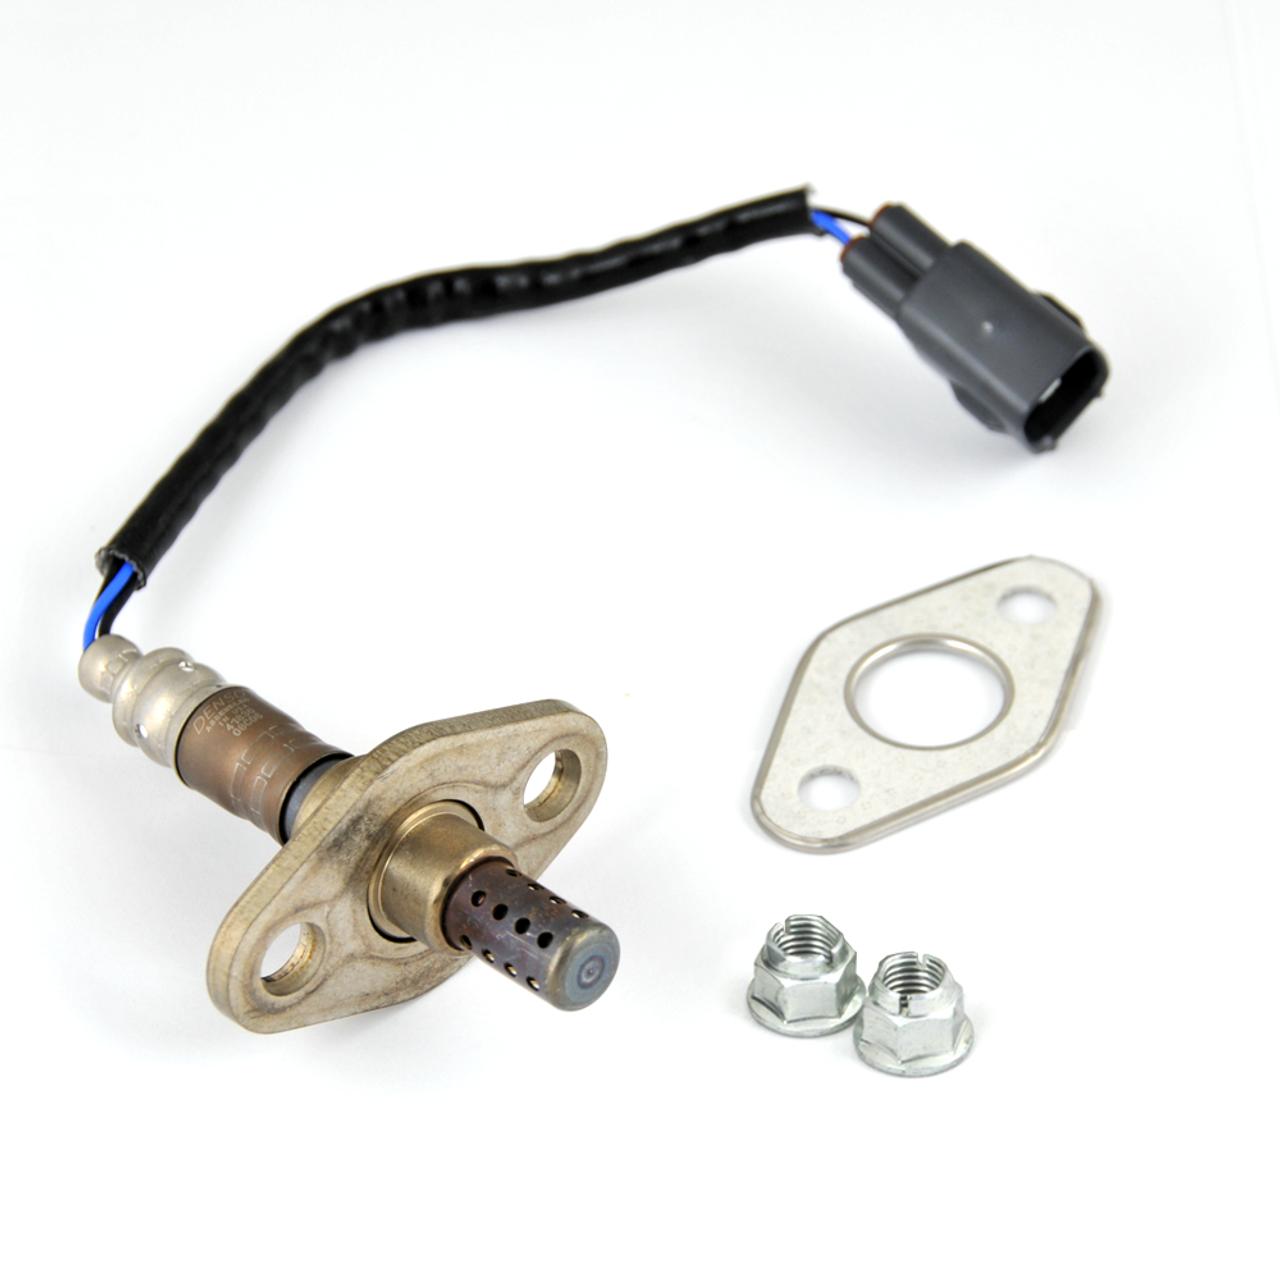 80 Series Denso Oxygen Sensor- Front, Short Pigtail (DOS-2)